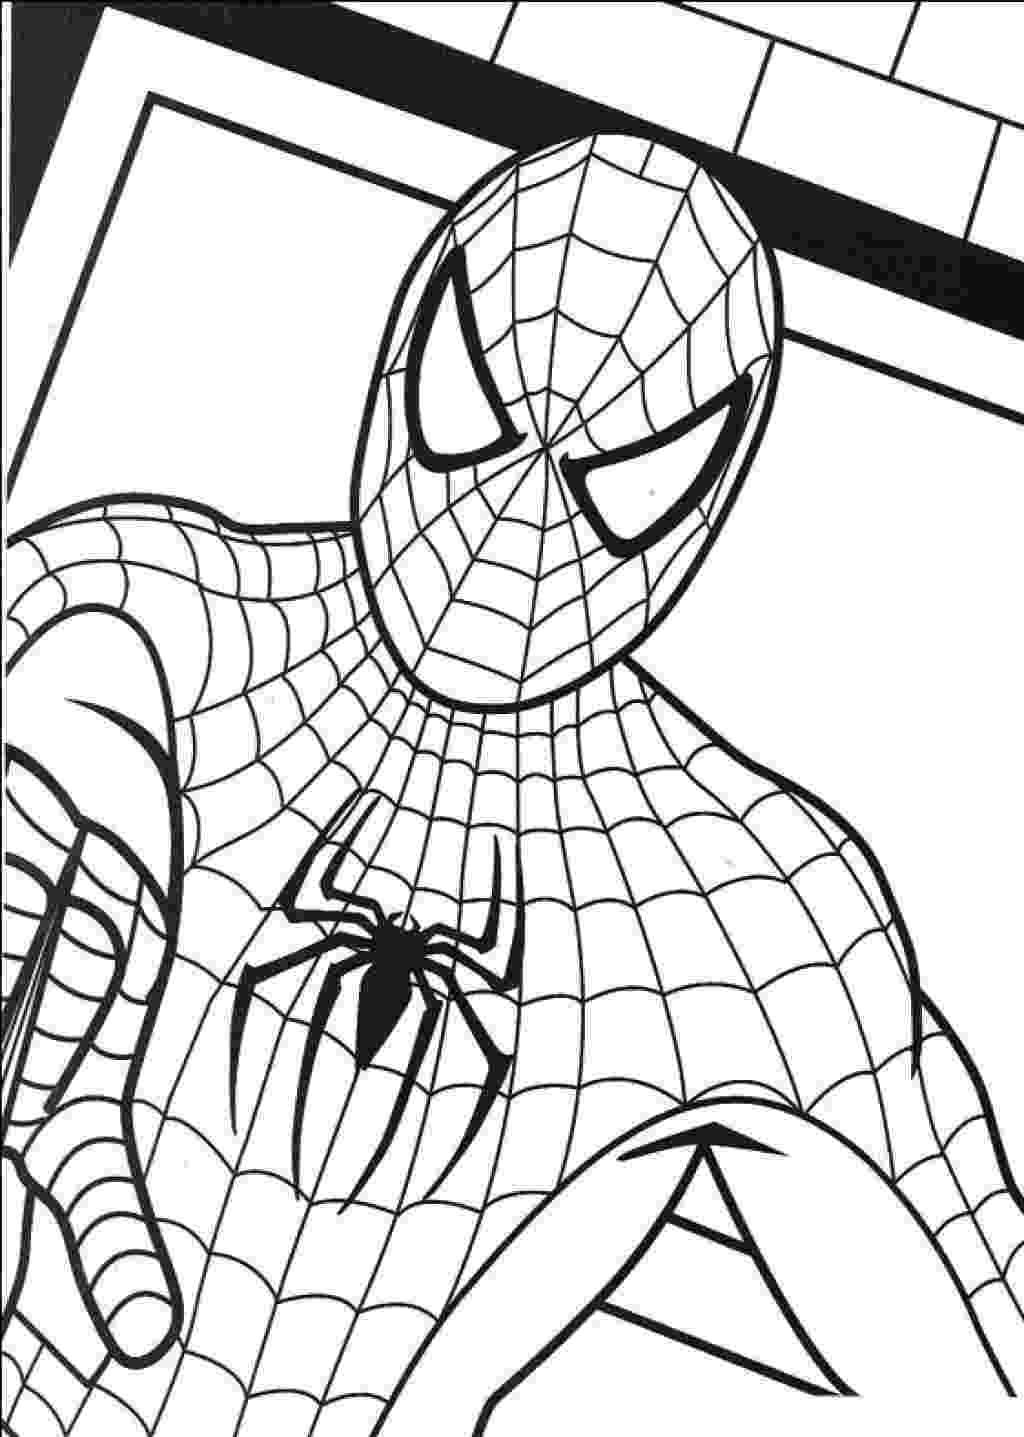 spiderman printout top 33 free printable spiderman coloring pages online printout spiderman